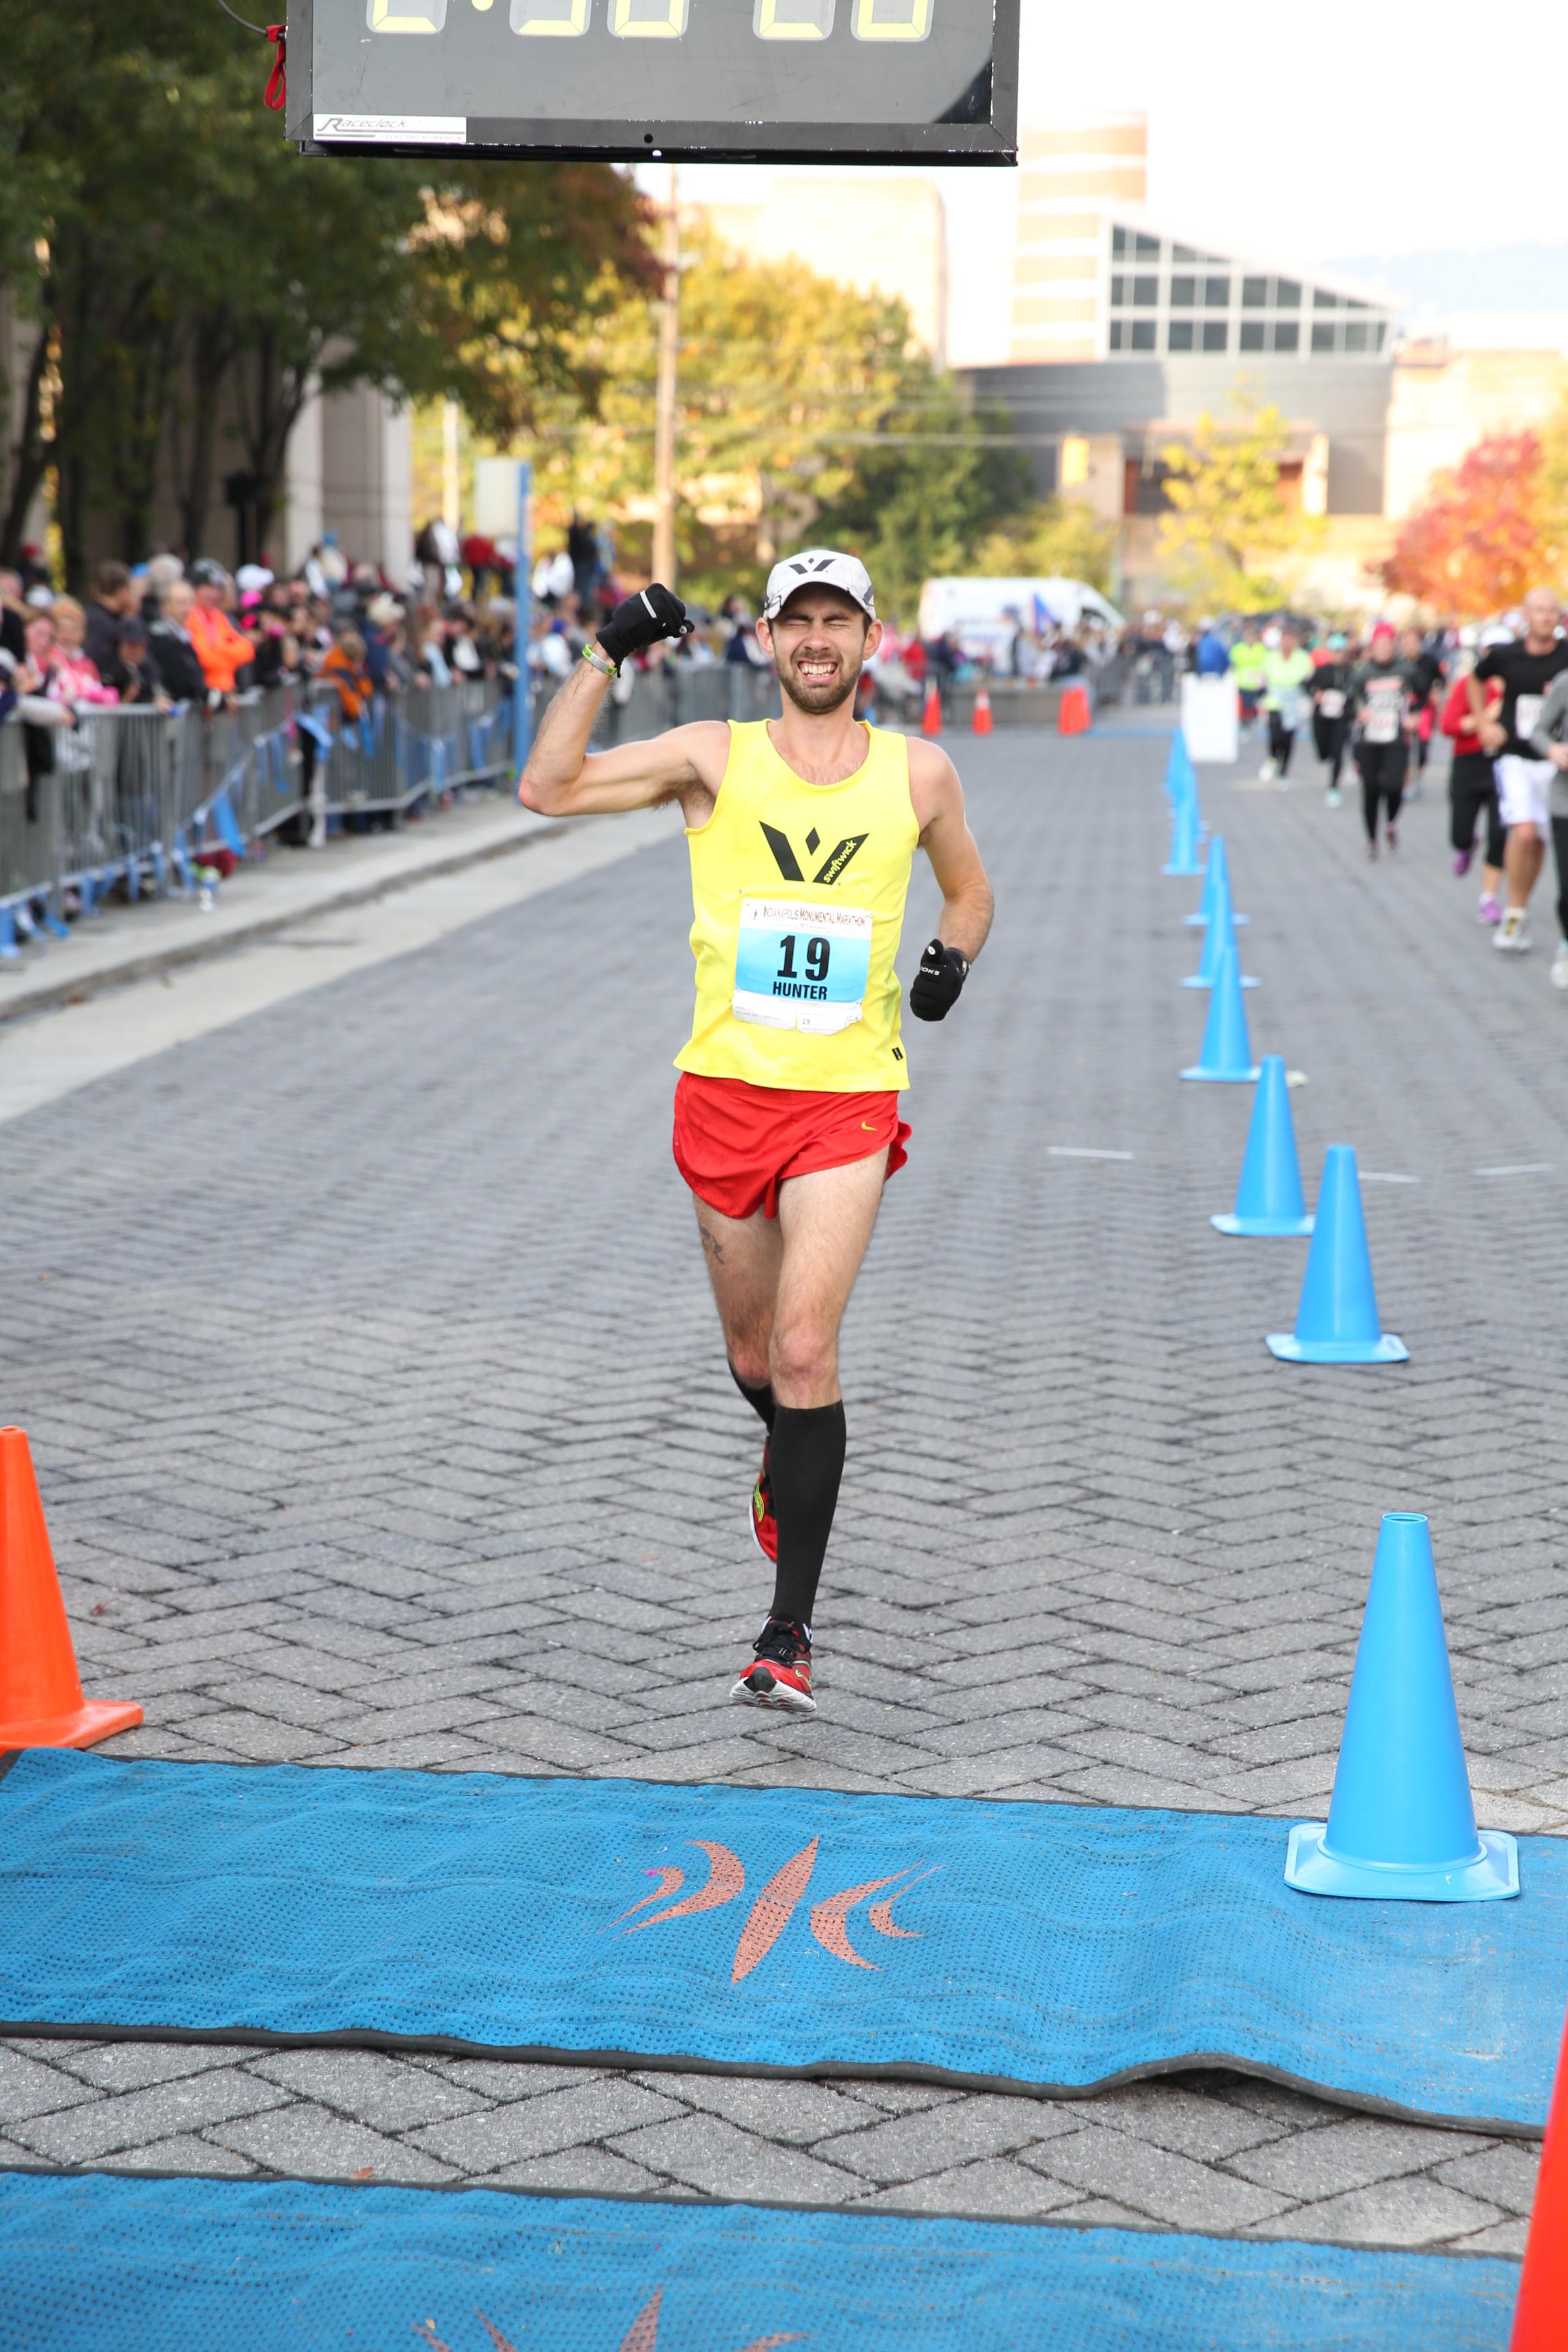 Indianapolis Finish Line